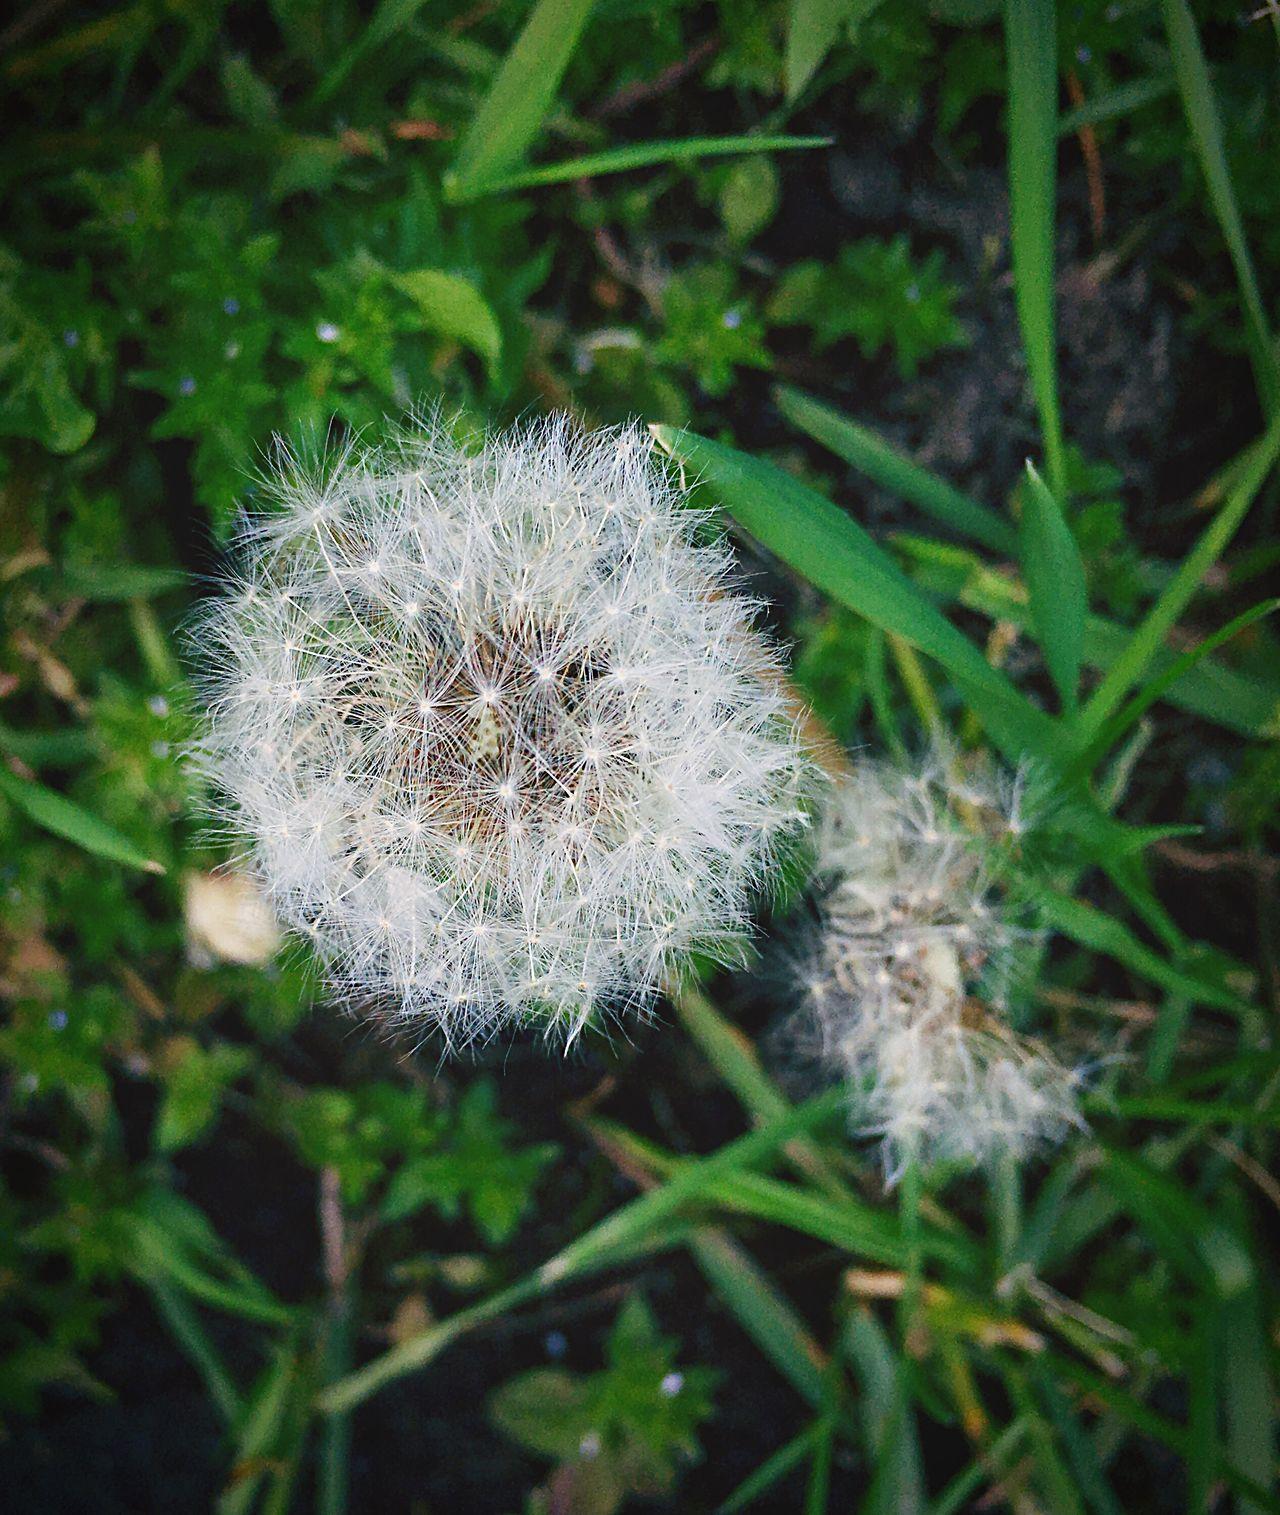 Flower Dandelion Fragility Nature Growth Flower Head Plant Beauty In Nature Softness Fuzzy Close-uppWildflowerr White ColorrFocus On Foregroundd No PeopleeDayyOutdoorssSpringtimee